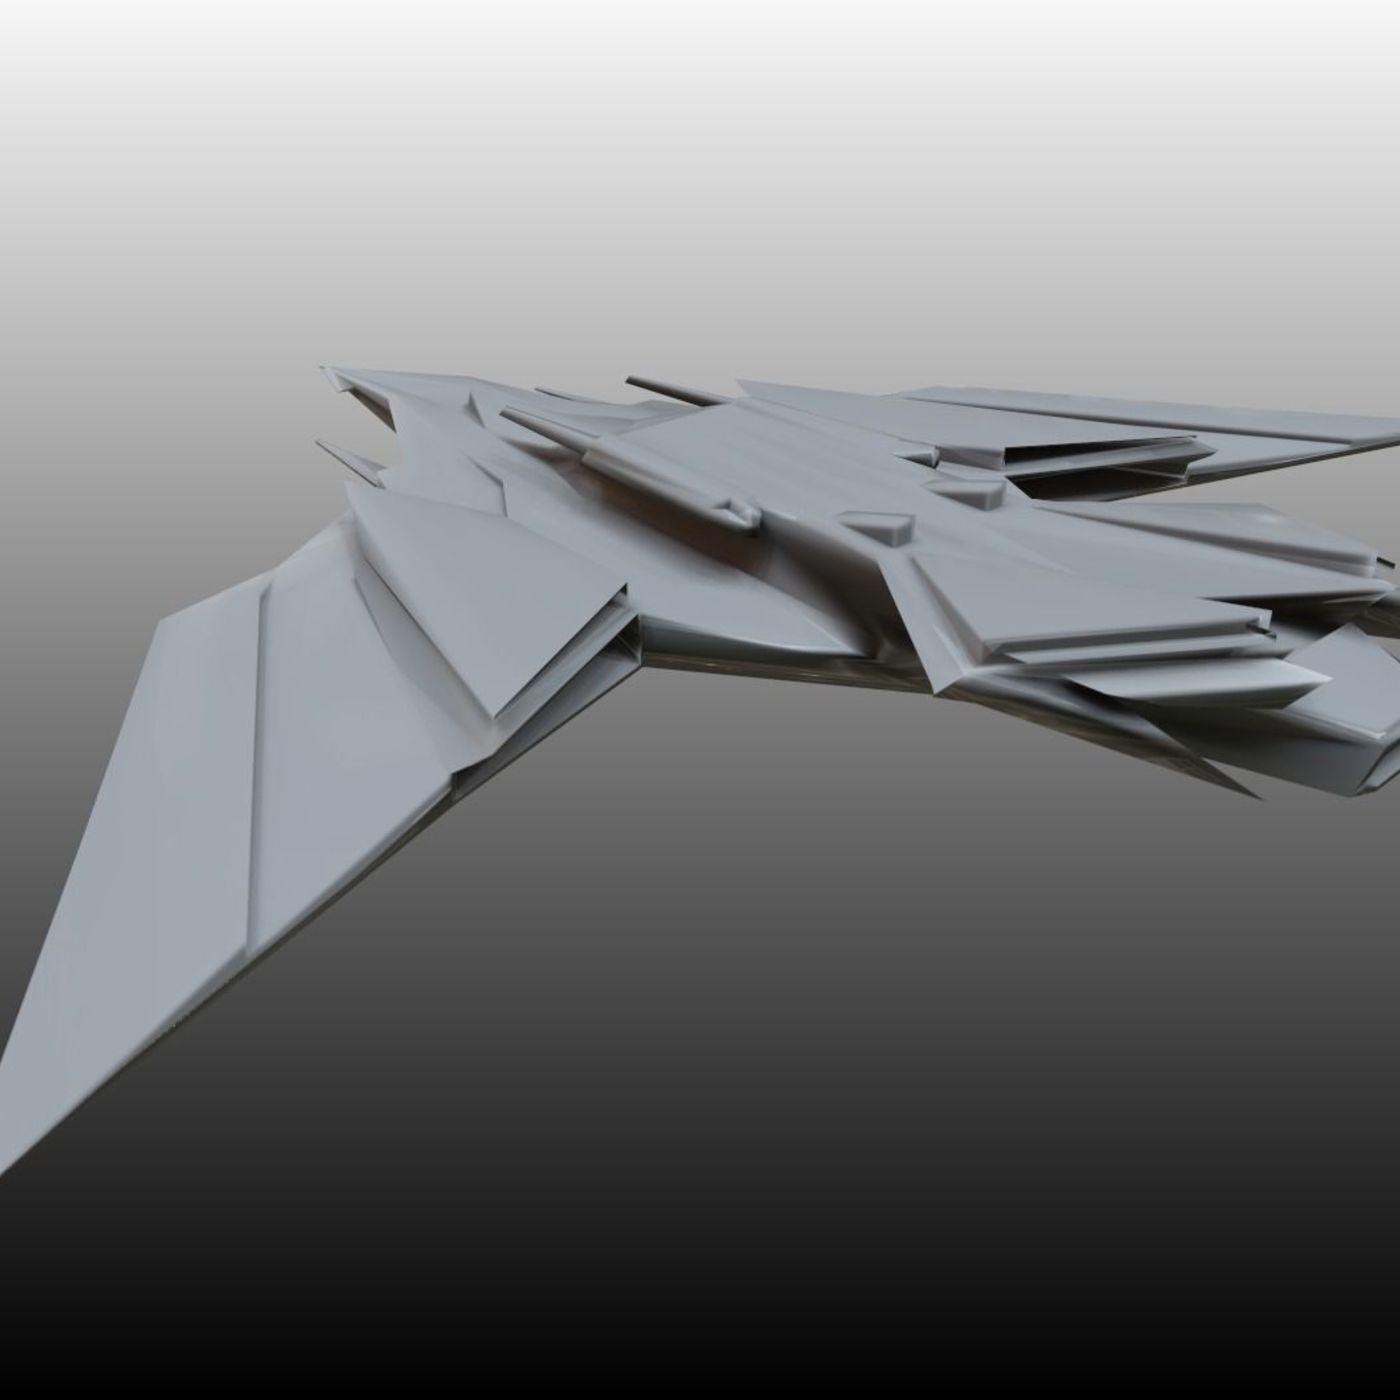 SciFi Jet (textured)